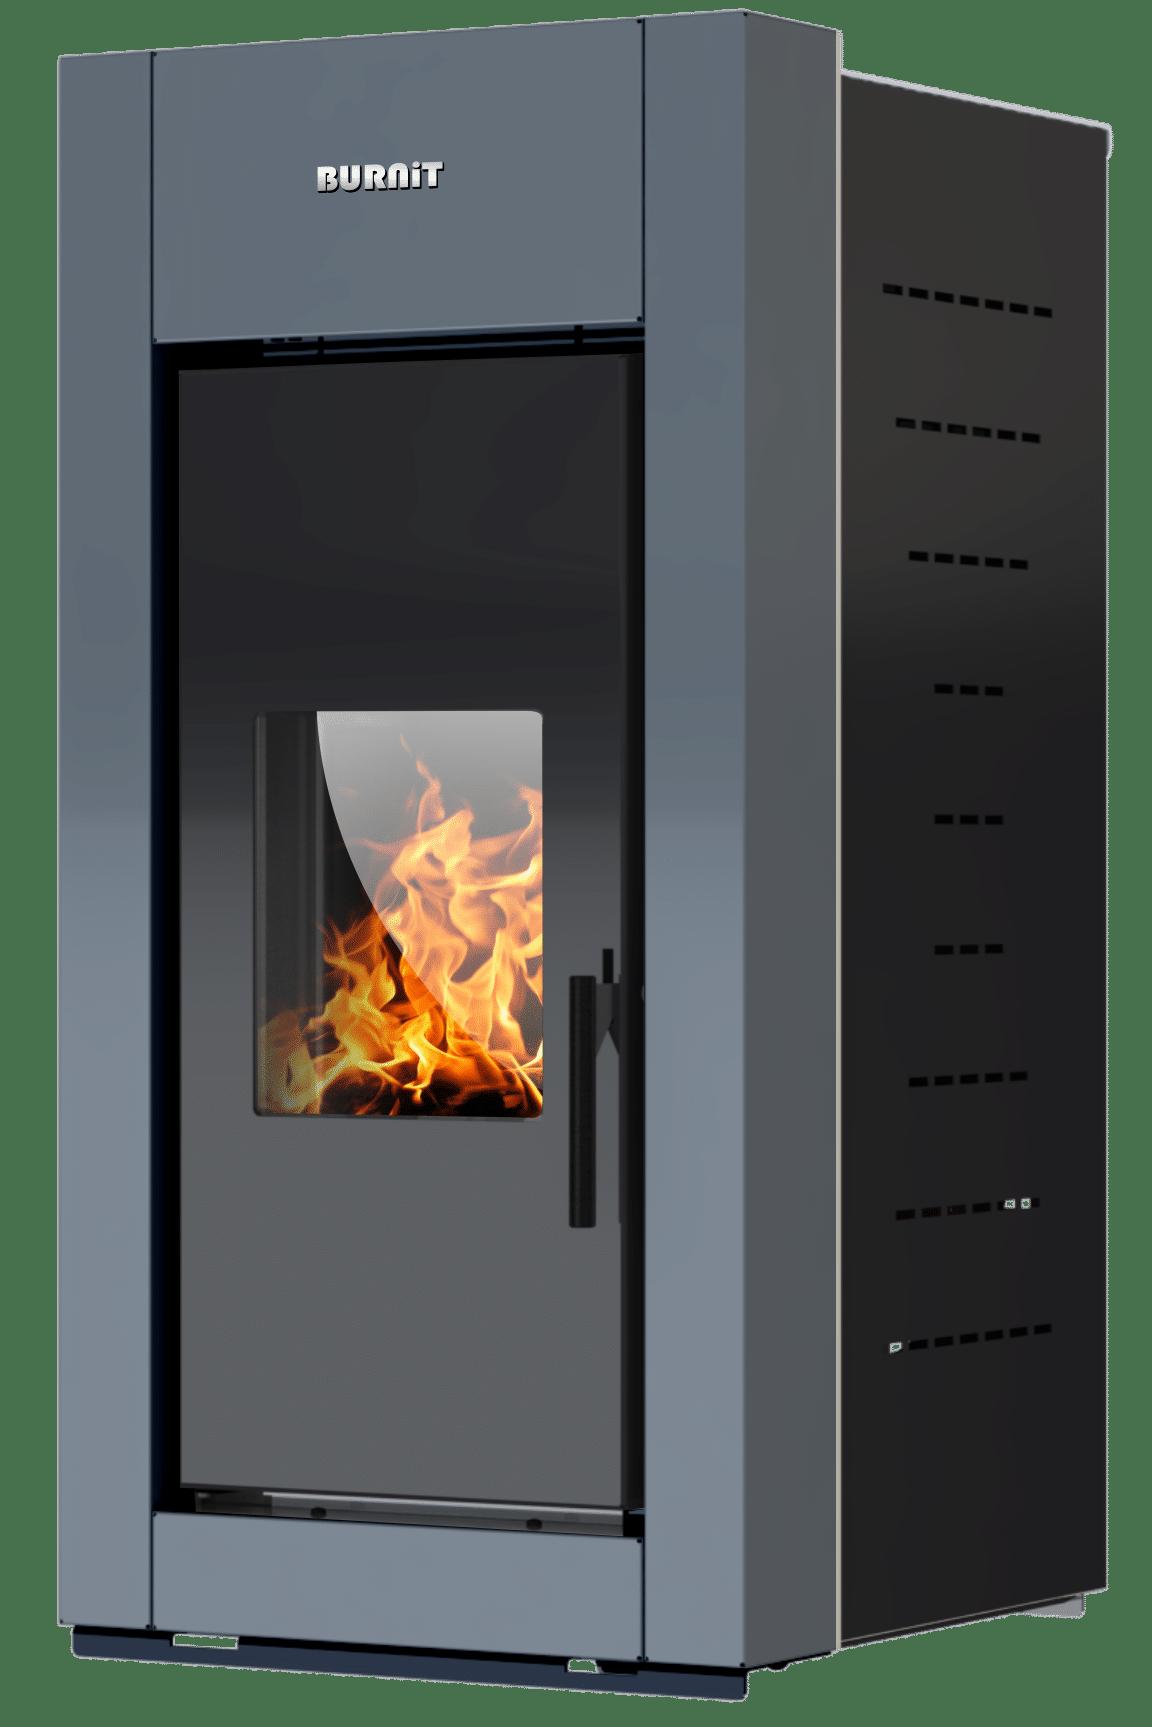 Pellet stove Trend_Anthracite Grey_Burnit